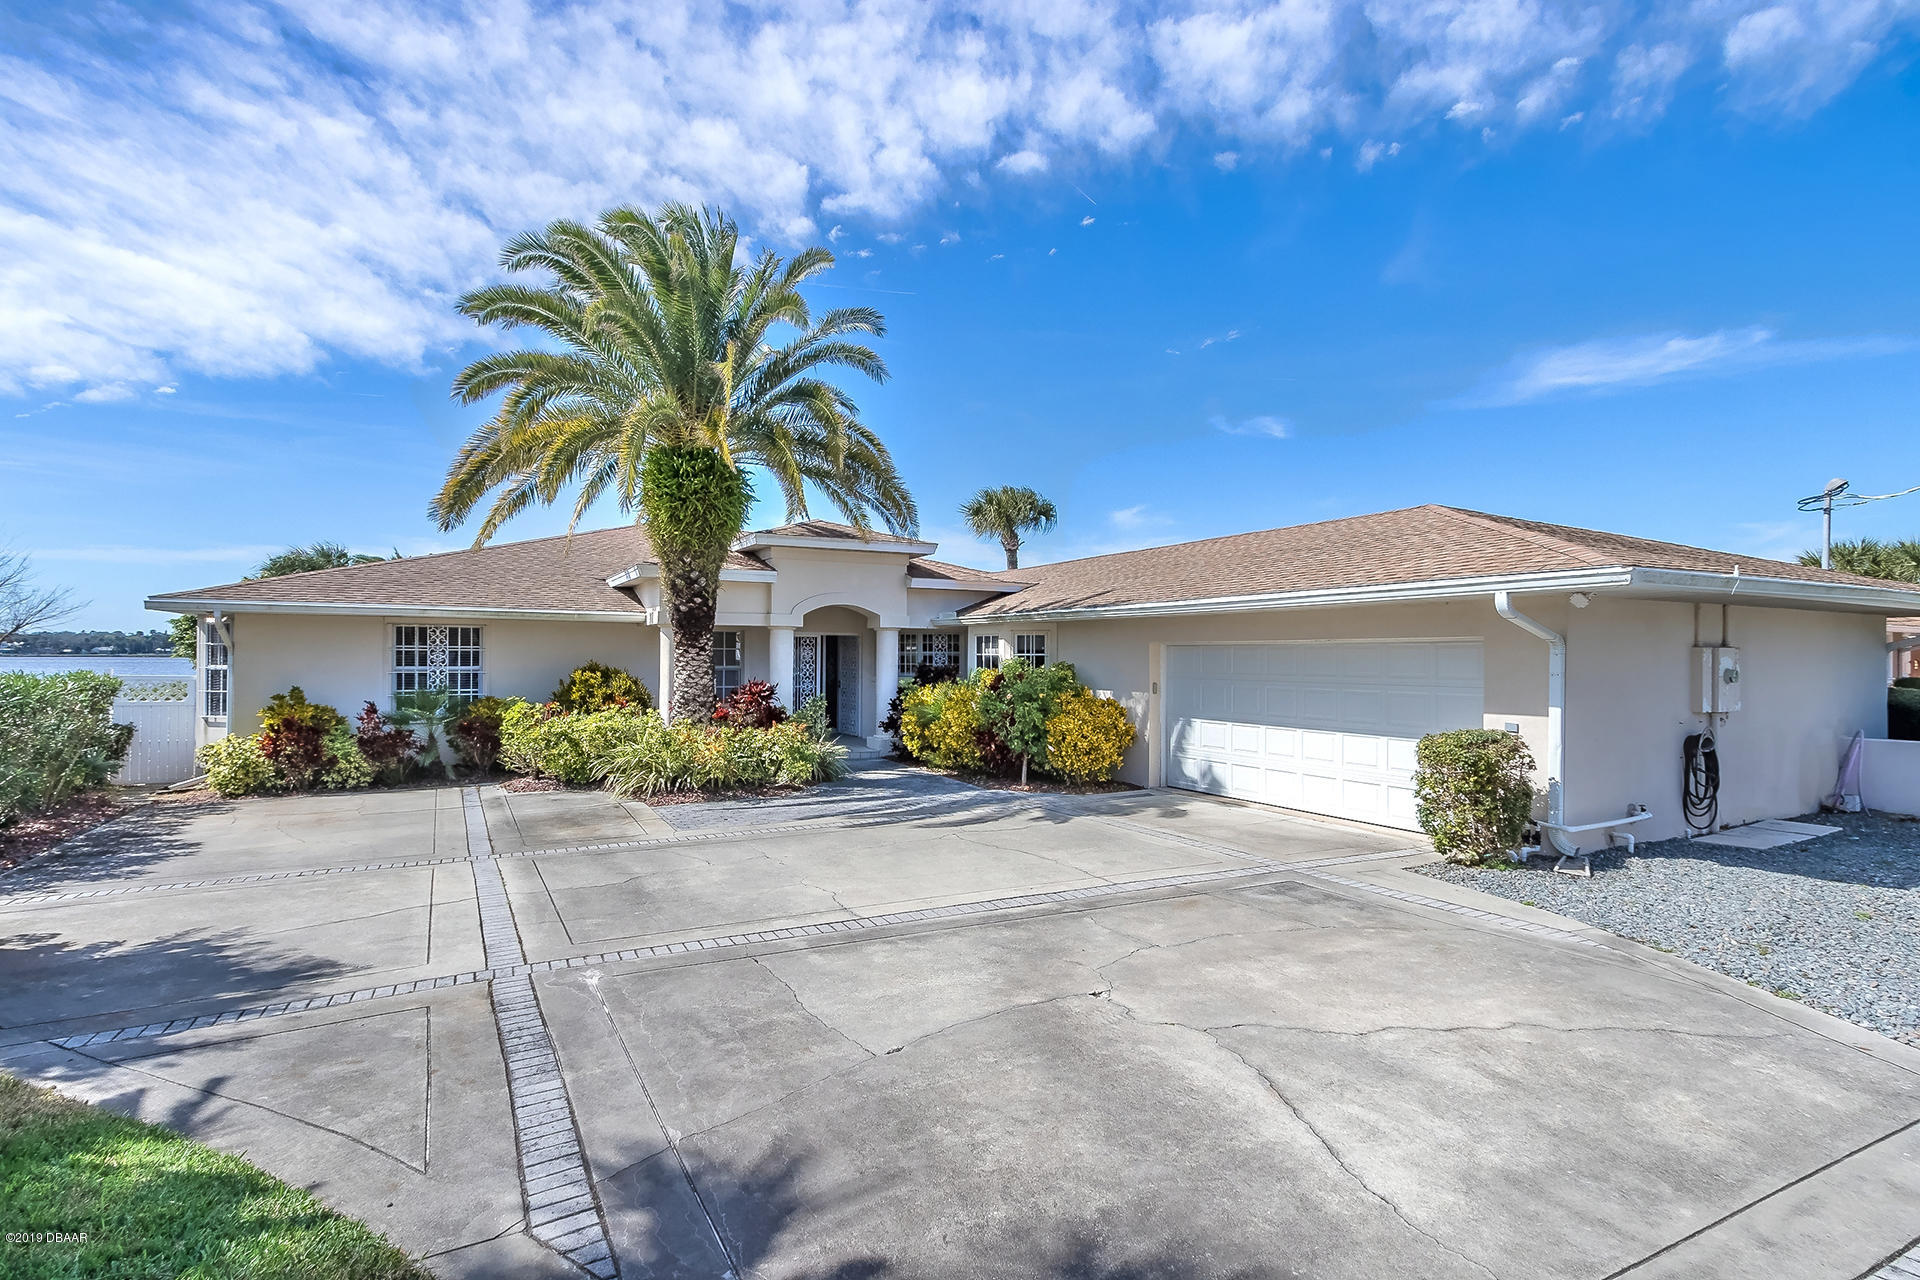 Photo of 444 Riverside Drive, Ormond Beach, FL 32176